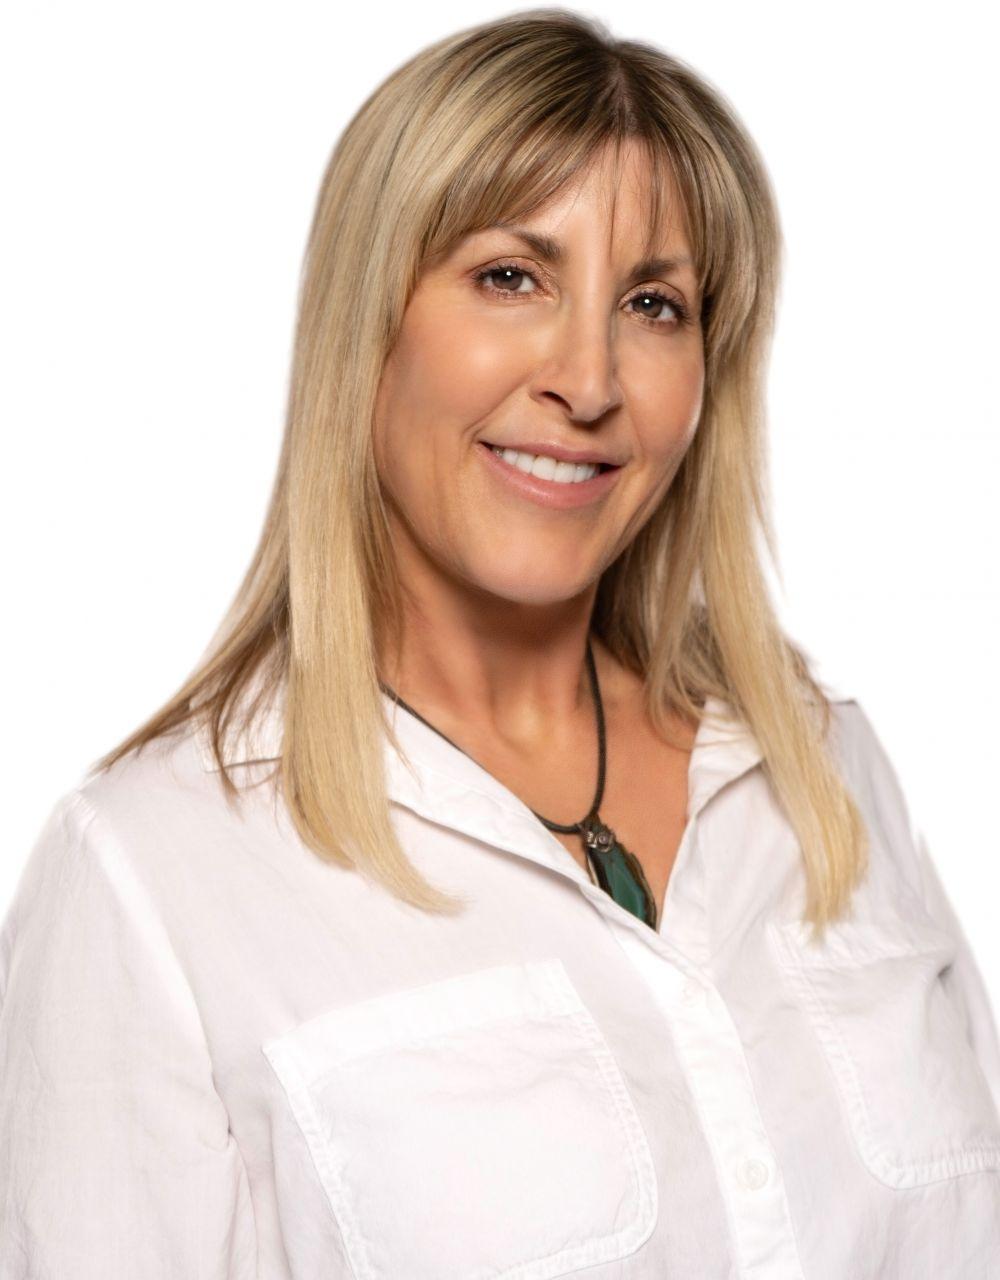 Monique Kuntz